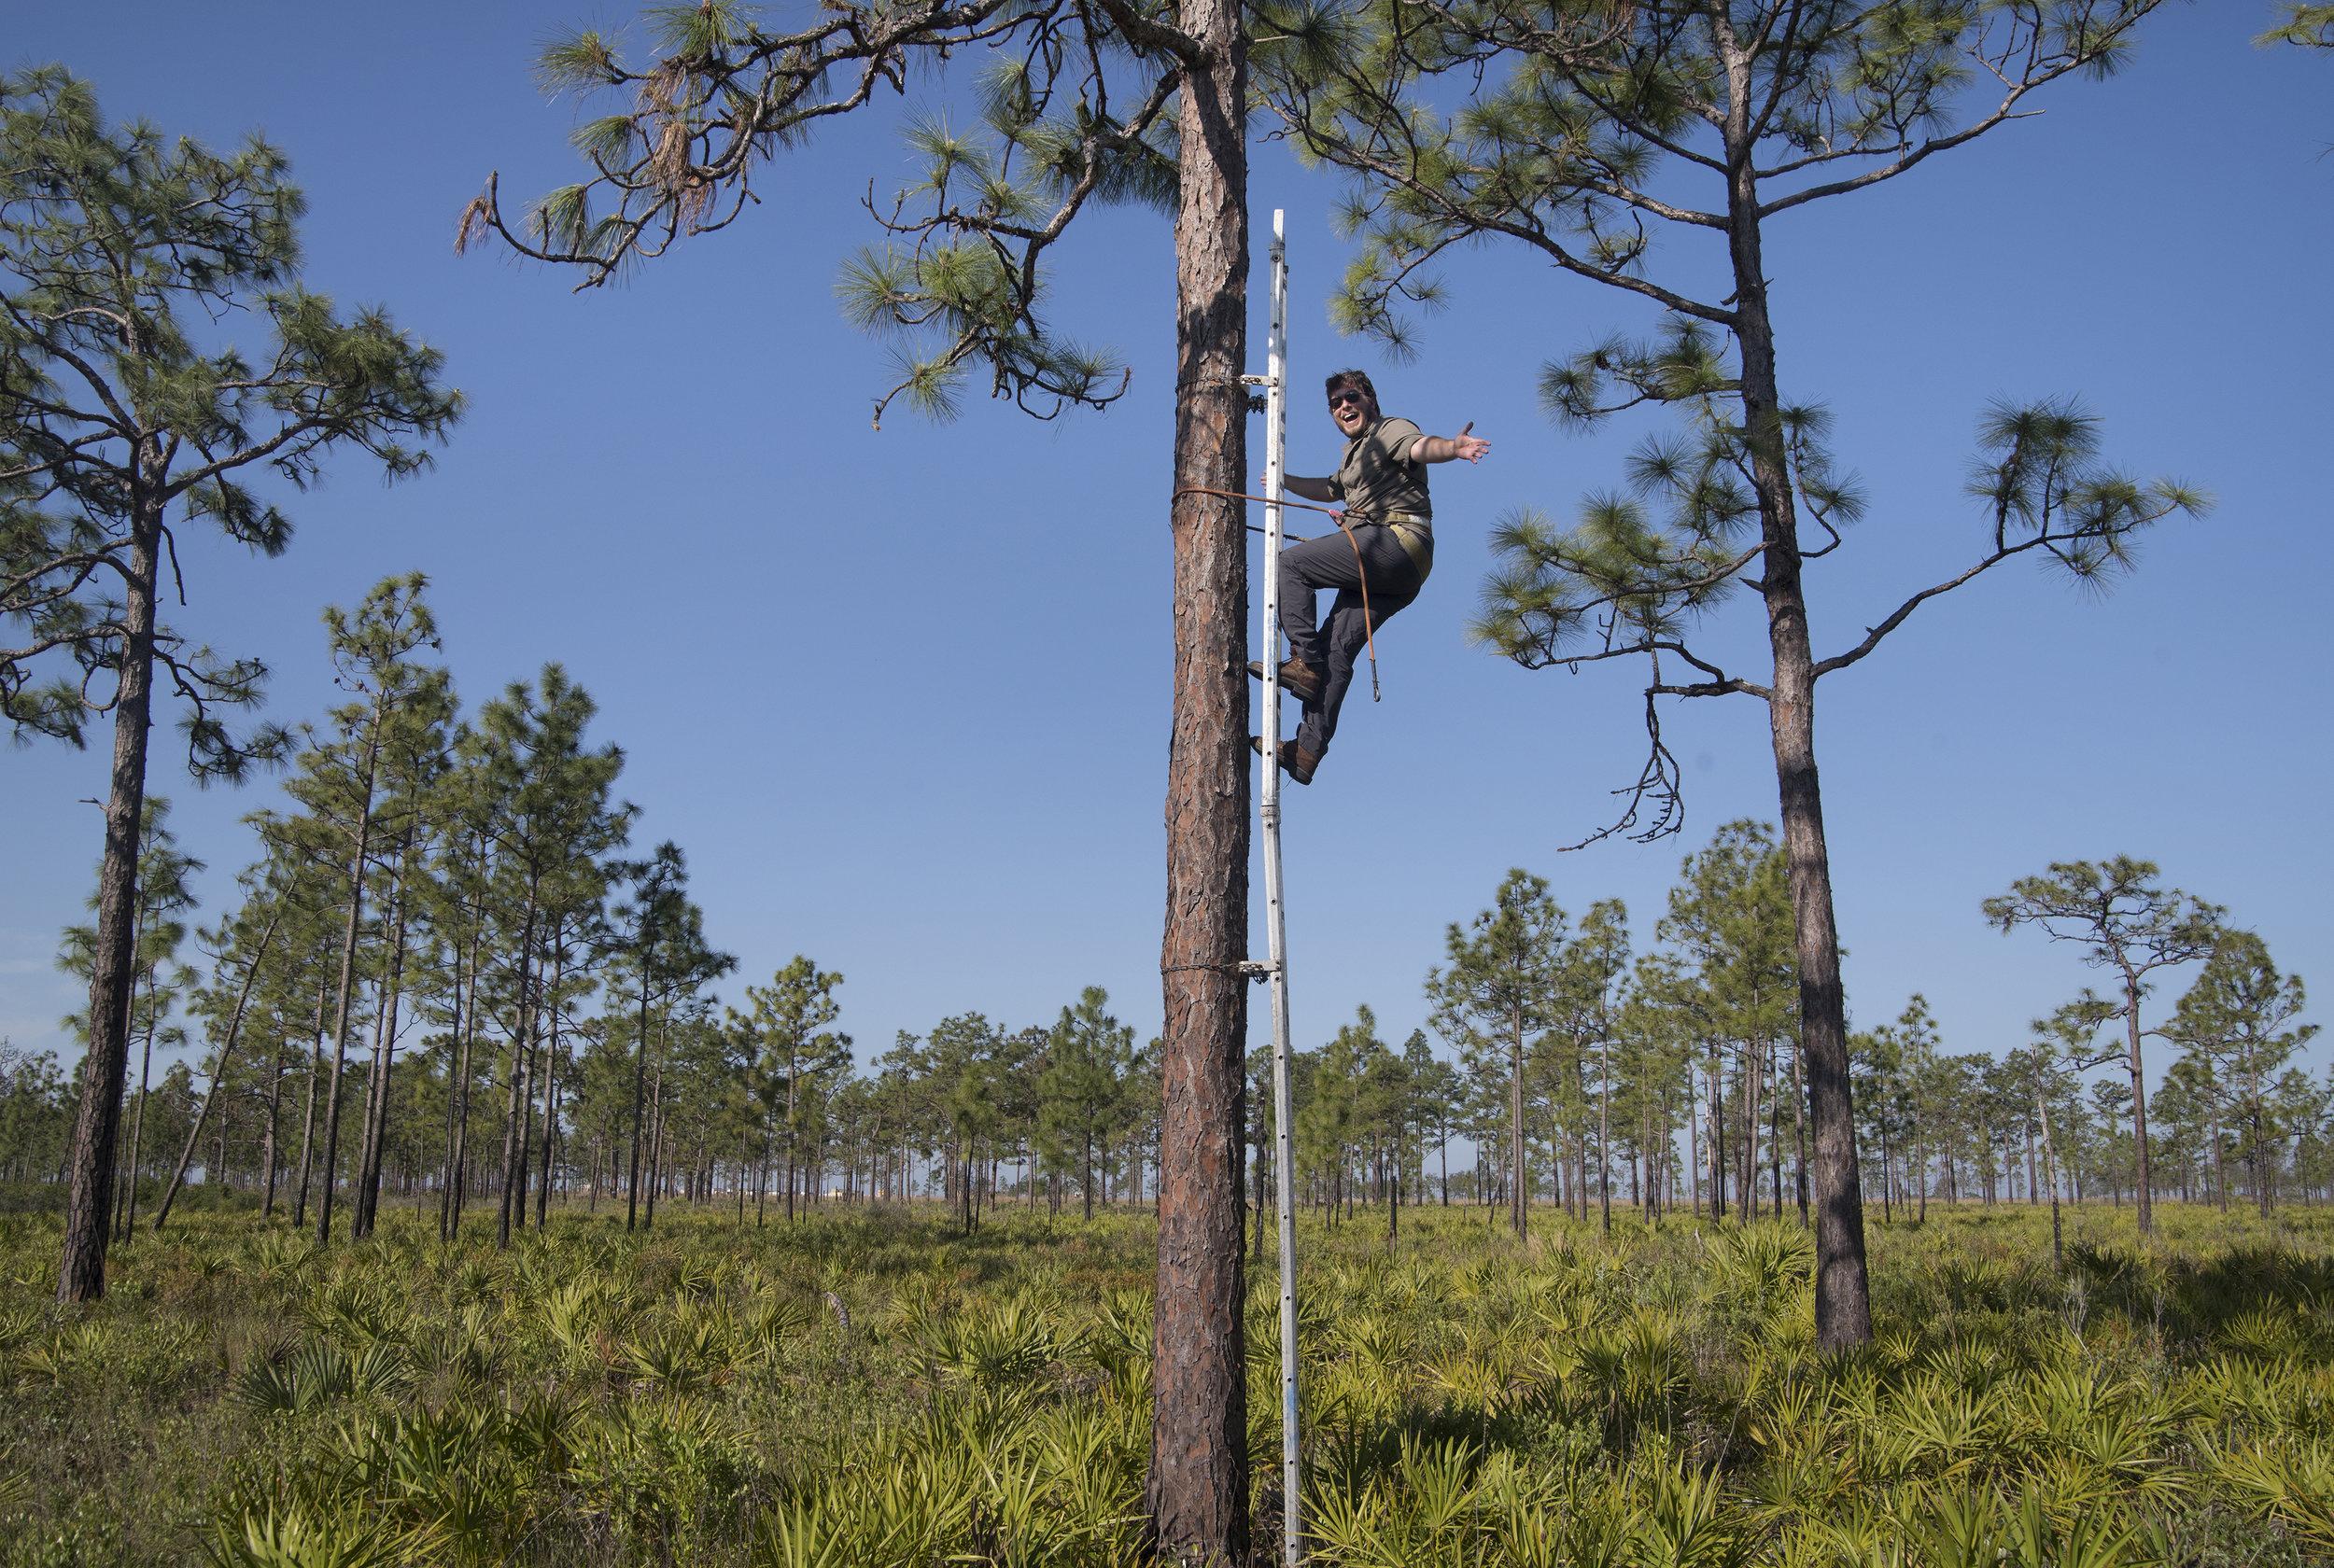 My first time using a swedish ladder to climb a longleaf pine tree.